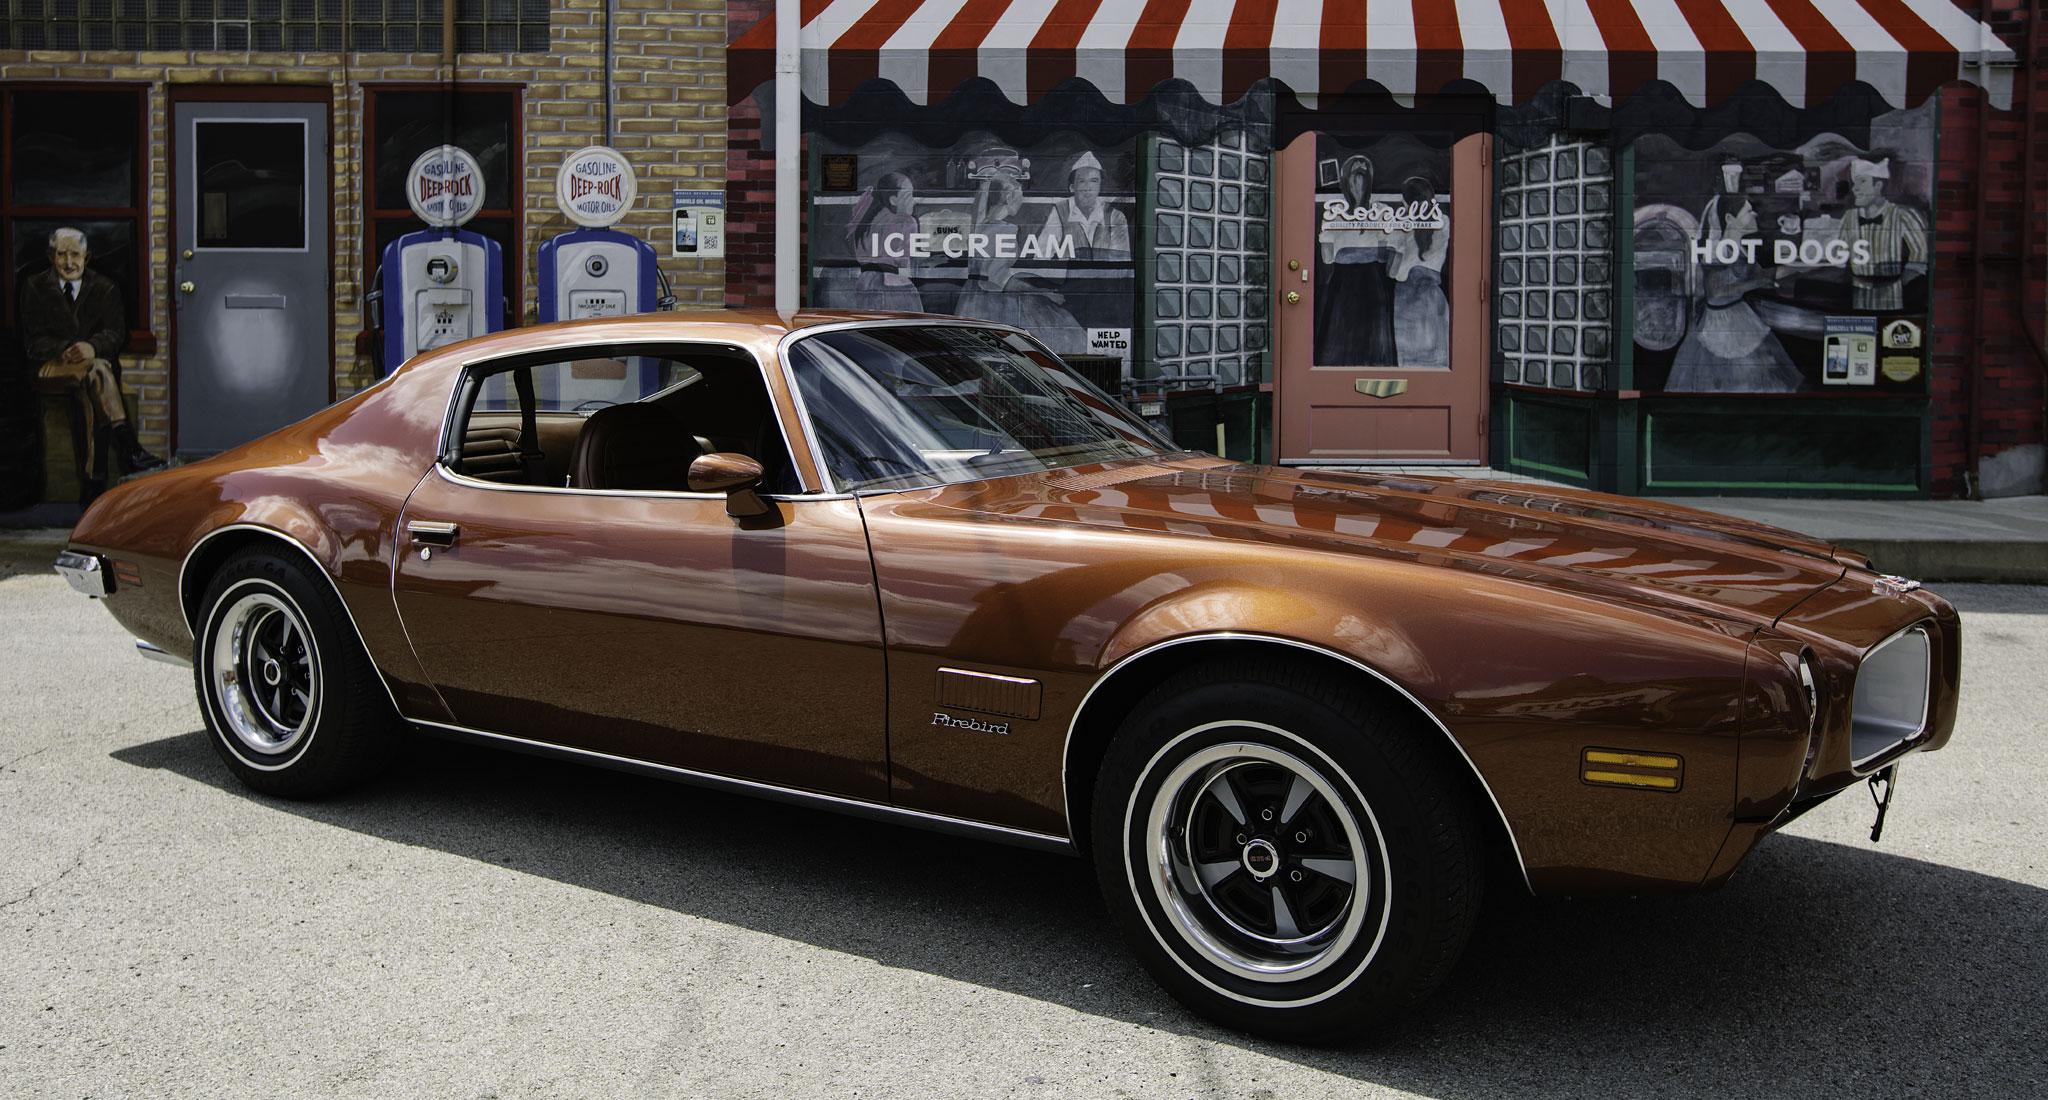 Classic Cars in Illinois